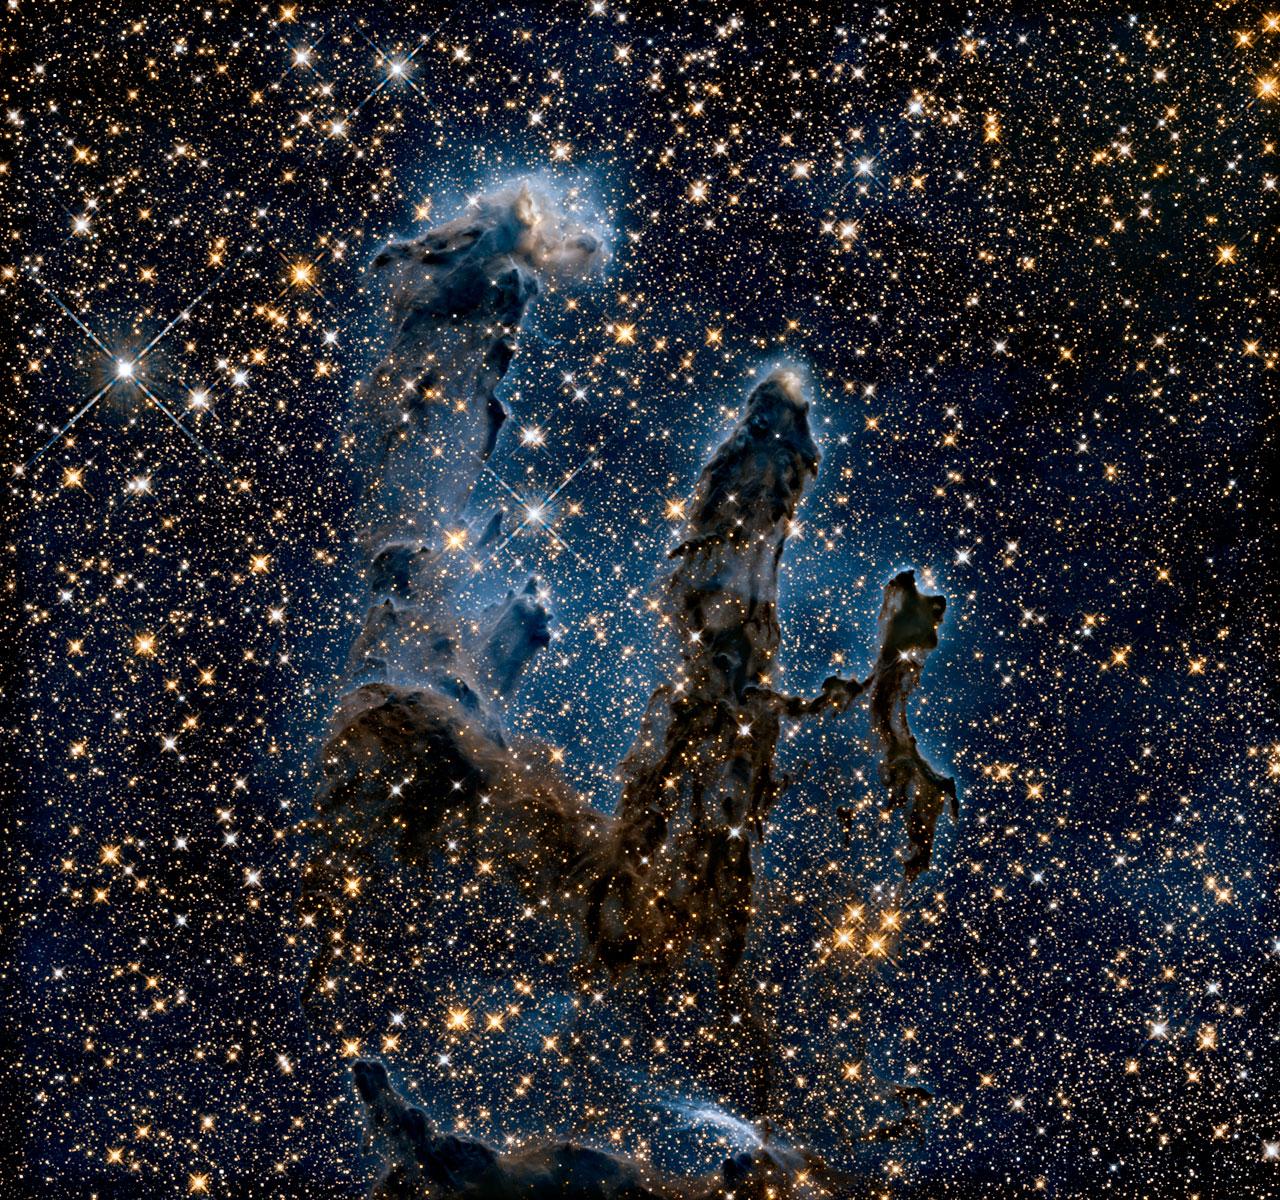 Messier 16 (The Eagle Nebula) | NASA